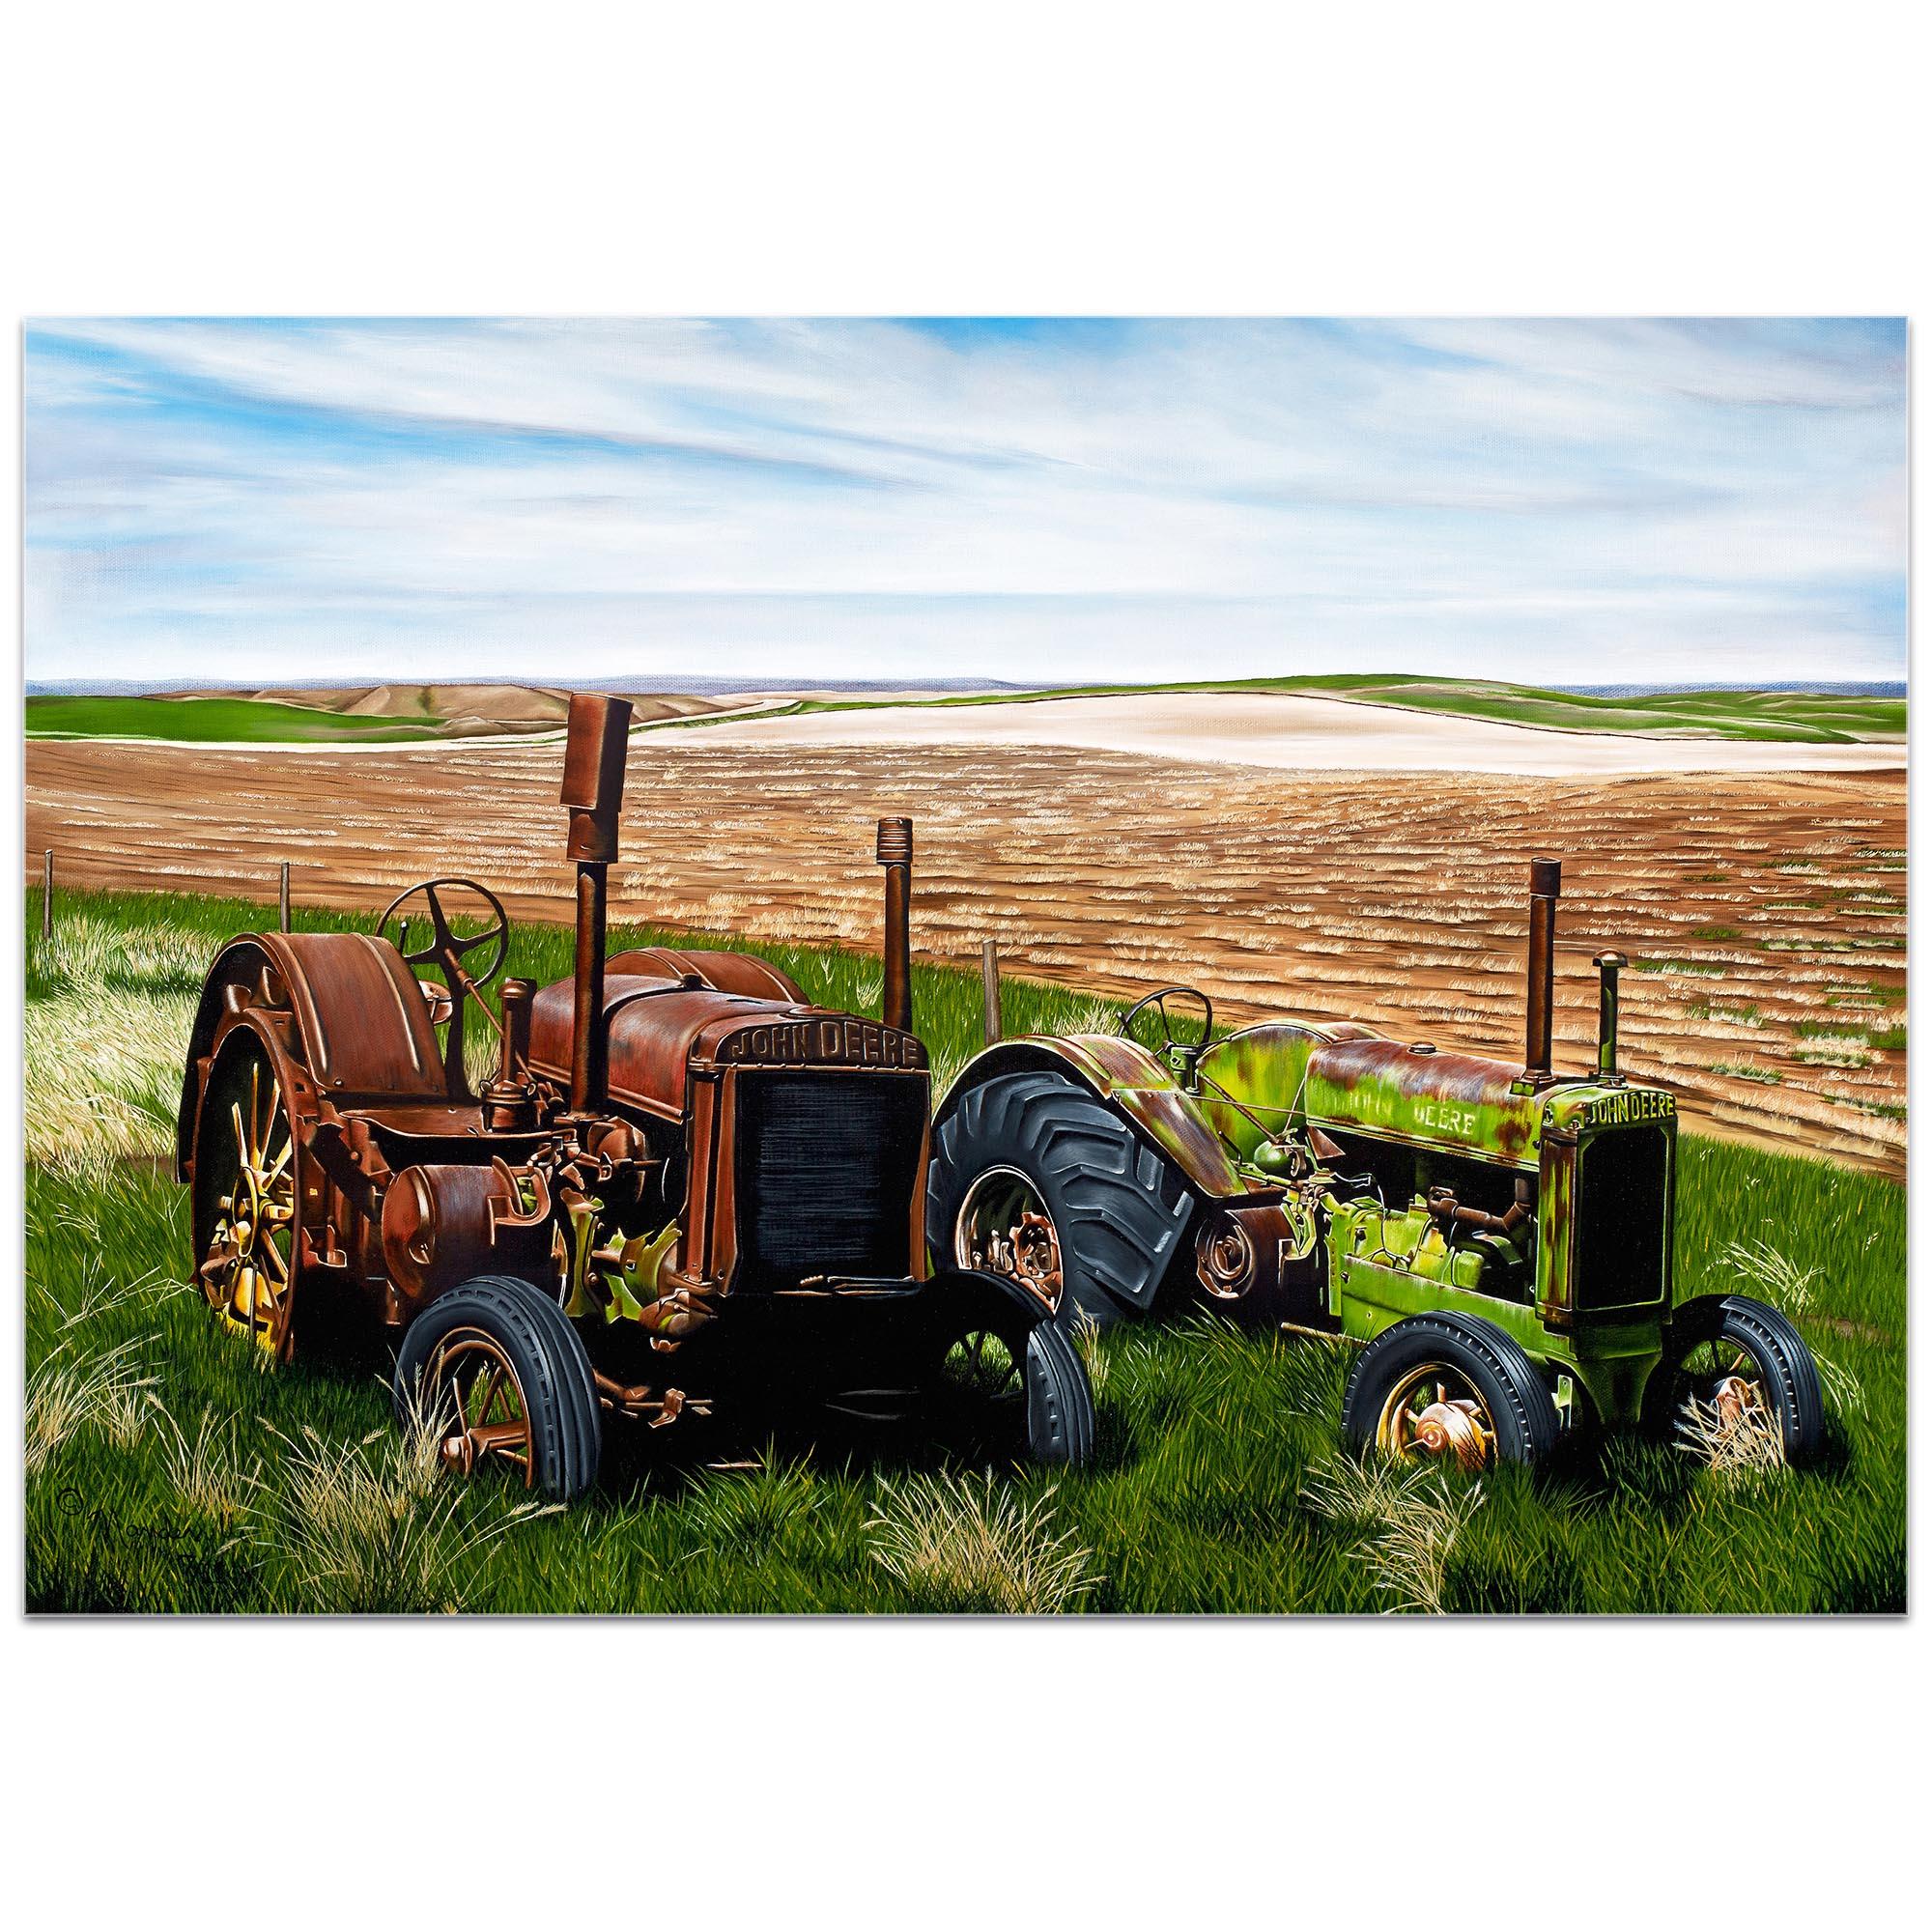 Americana Wall Art 'Two John Boys' - Classic Tractor Decor on Metal or Plexiglass - Image 2